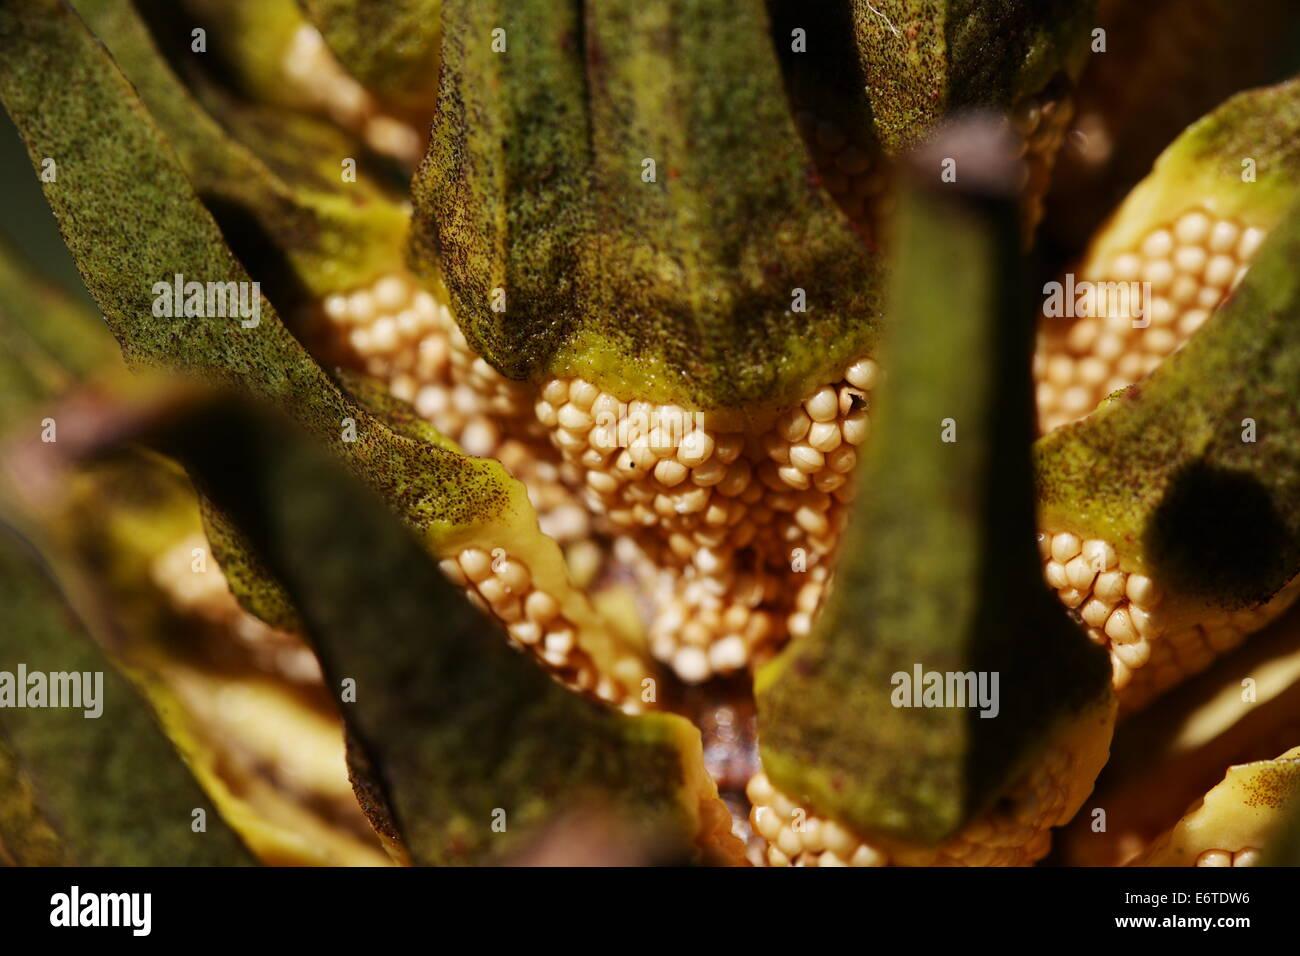 Close up of open scales of a male encephalartos cycad cone showing pollen sacs - Stock Image